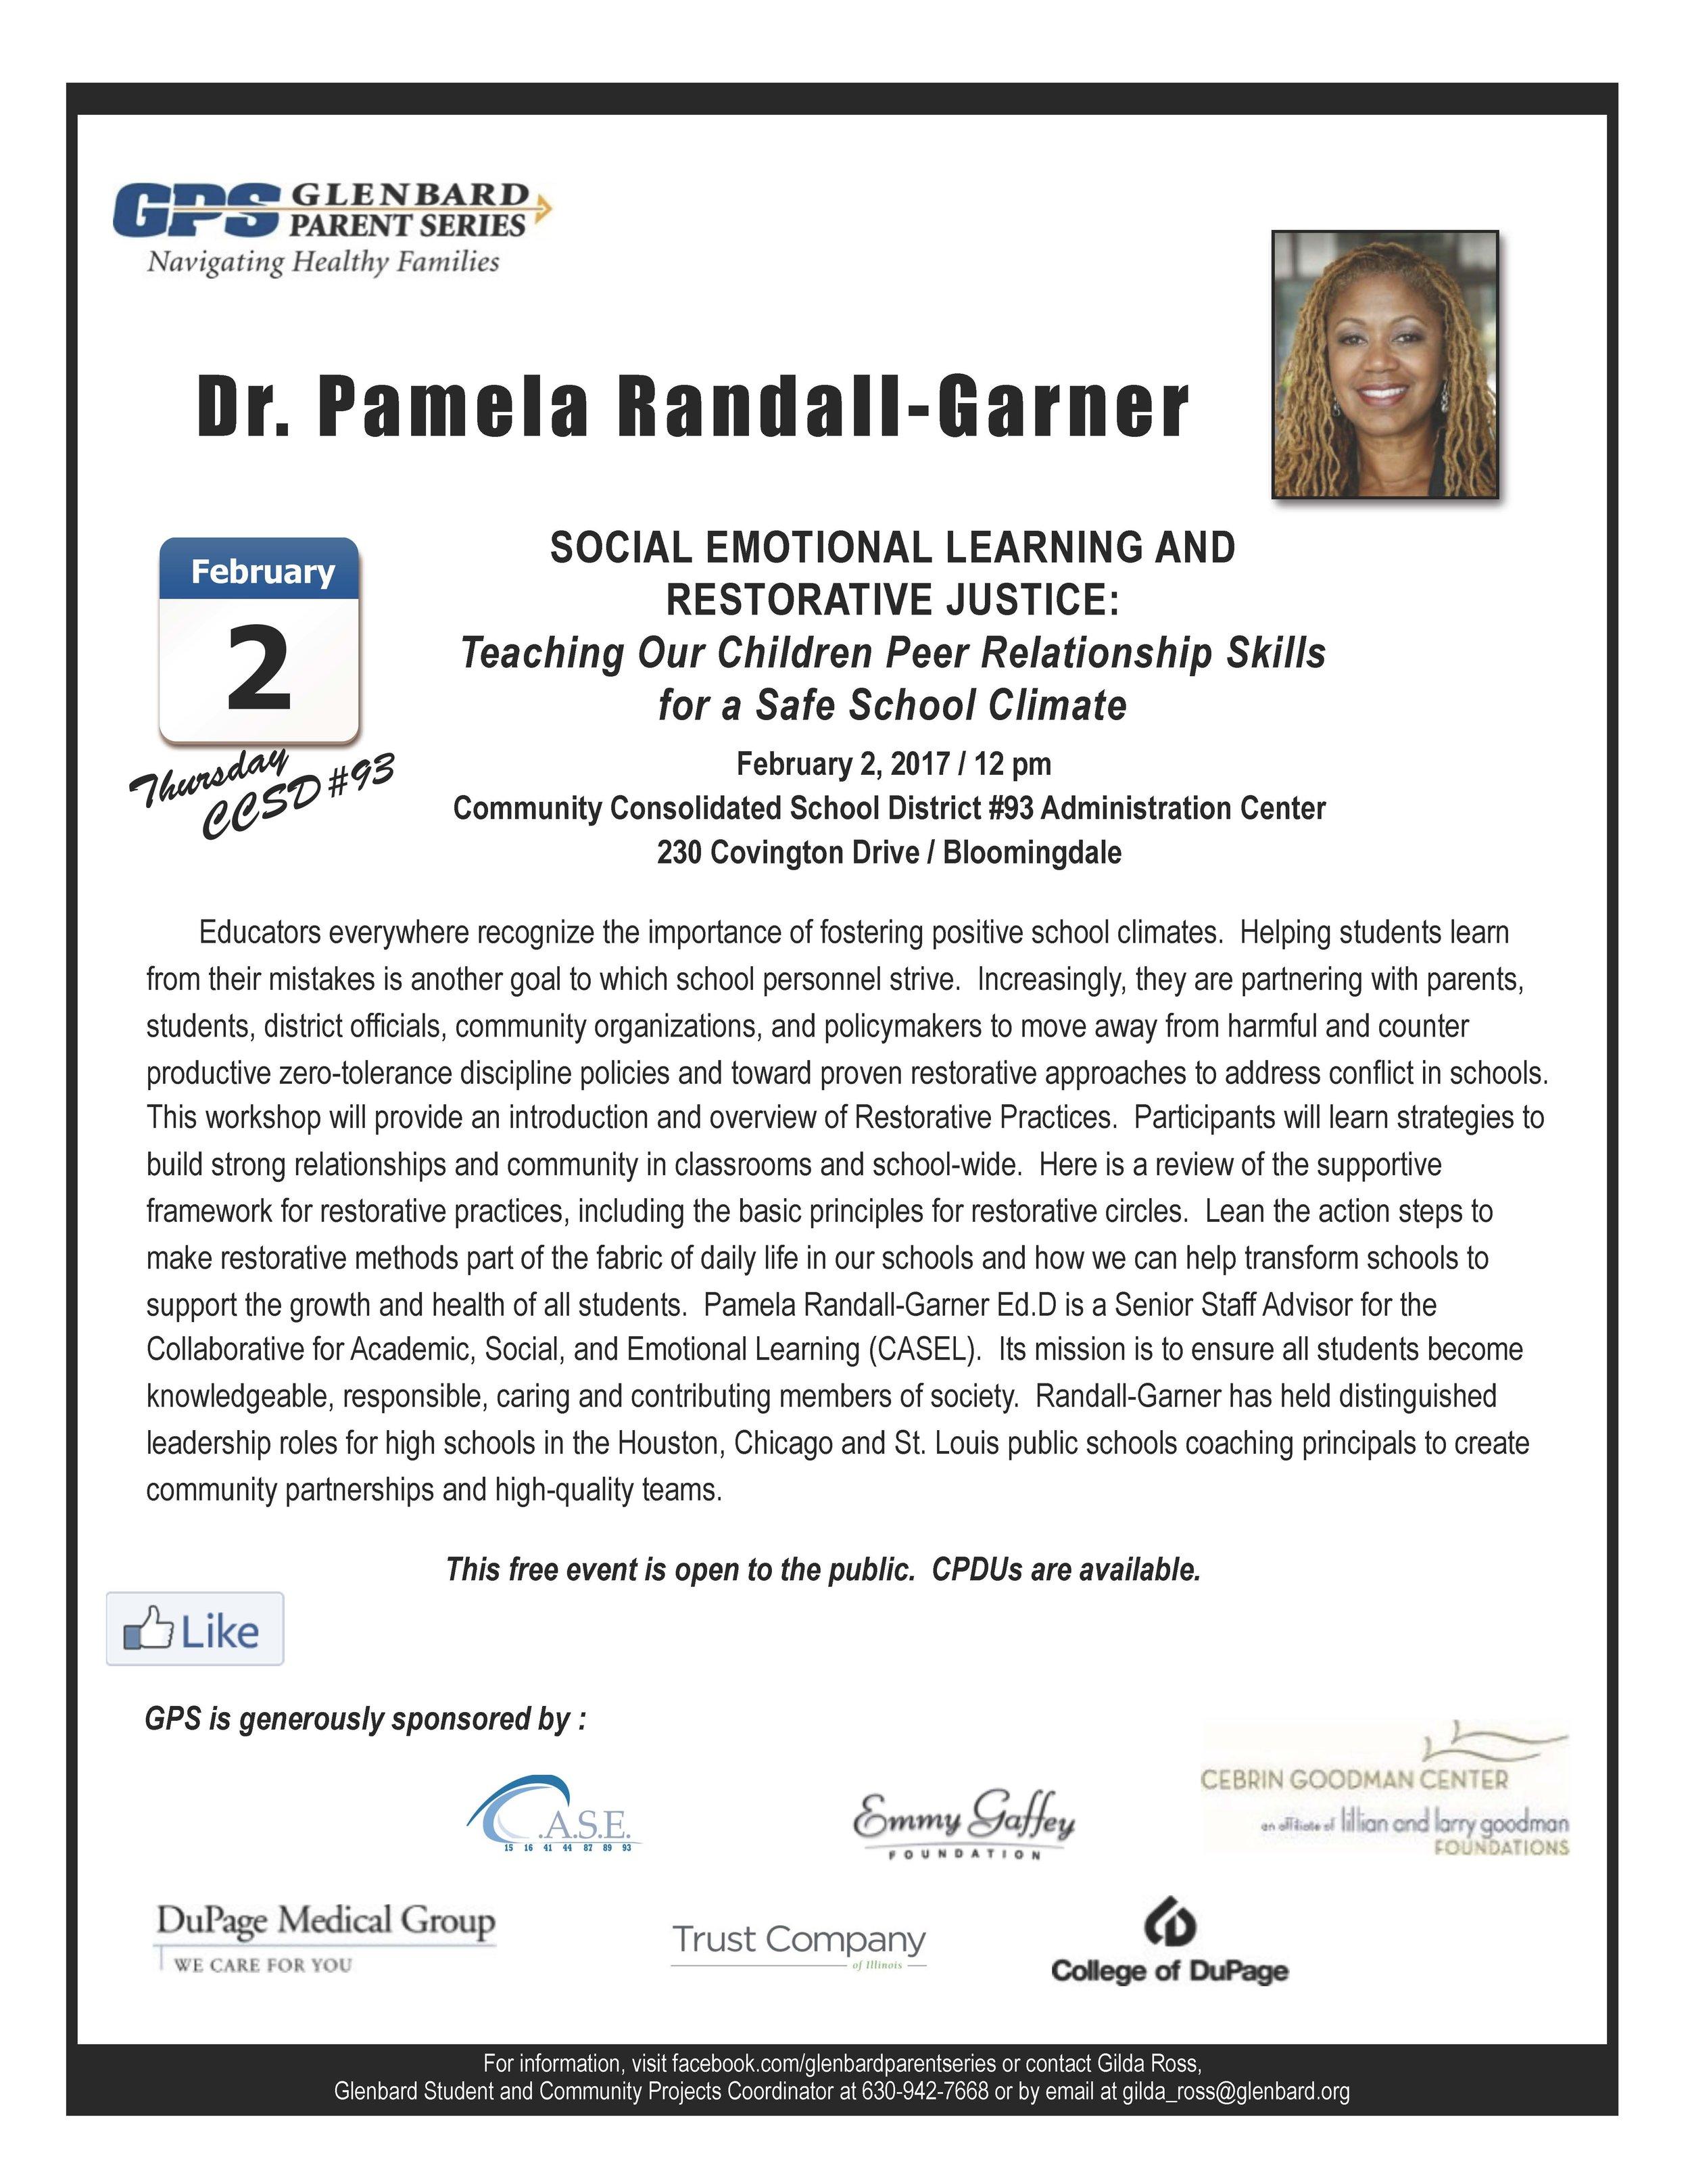 170202 Randall-Garner.1.jpg